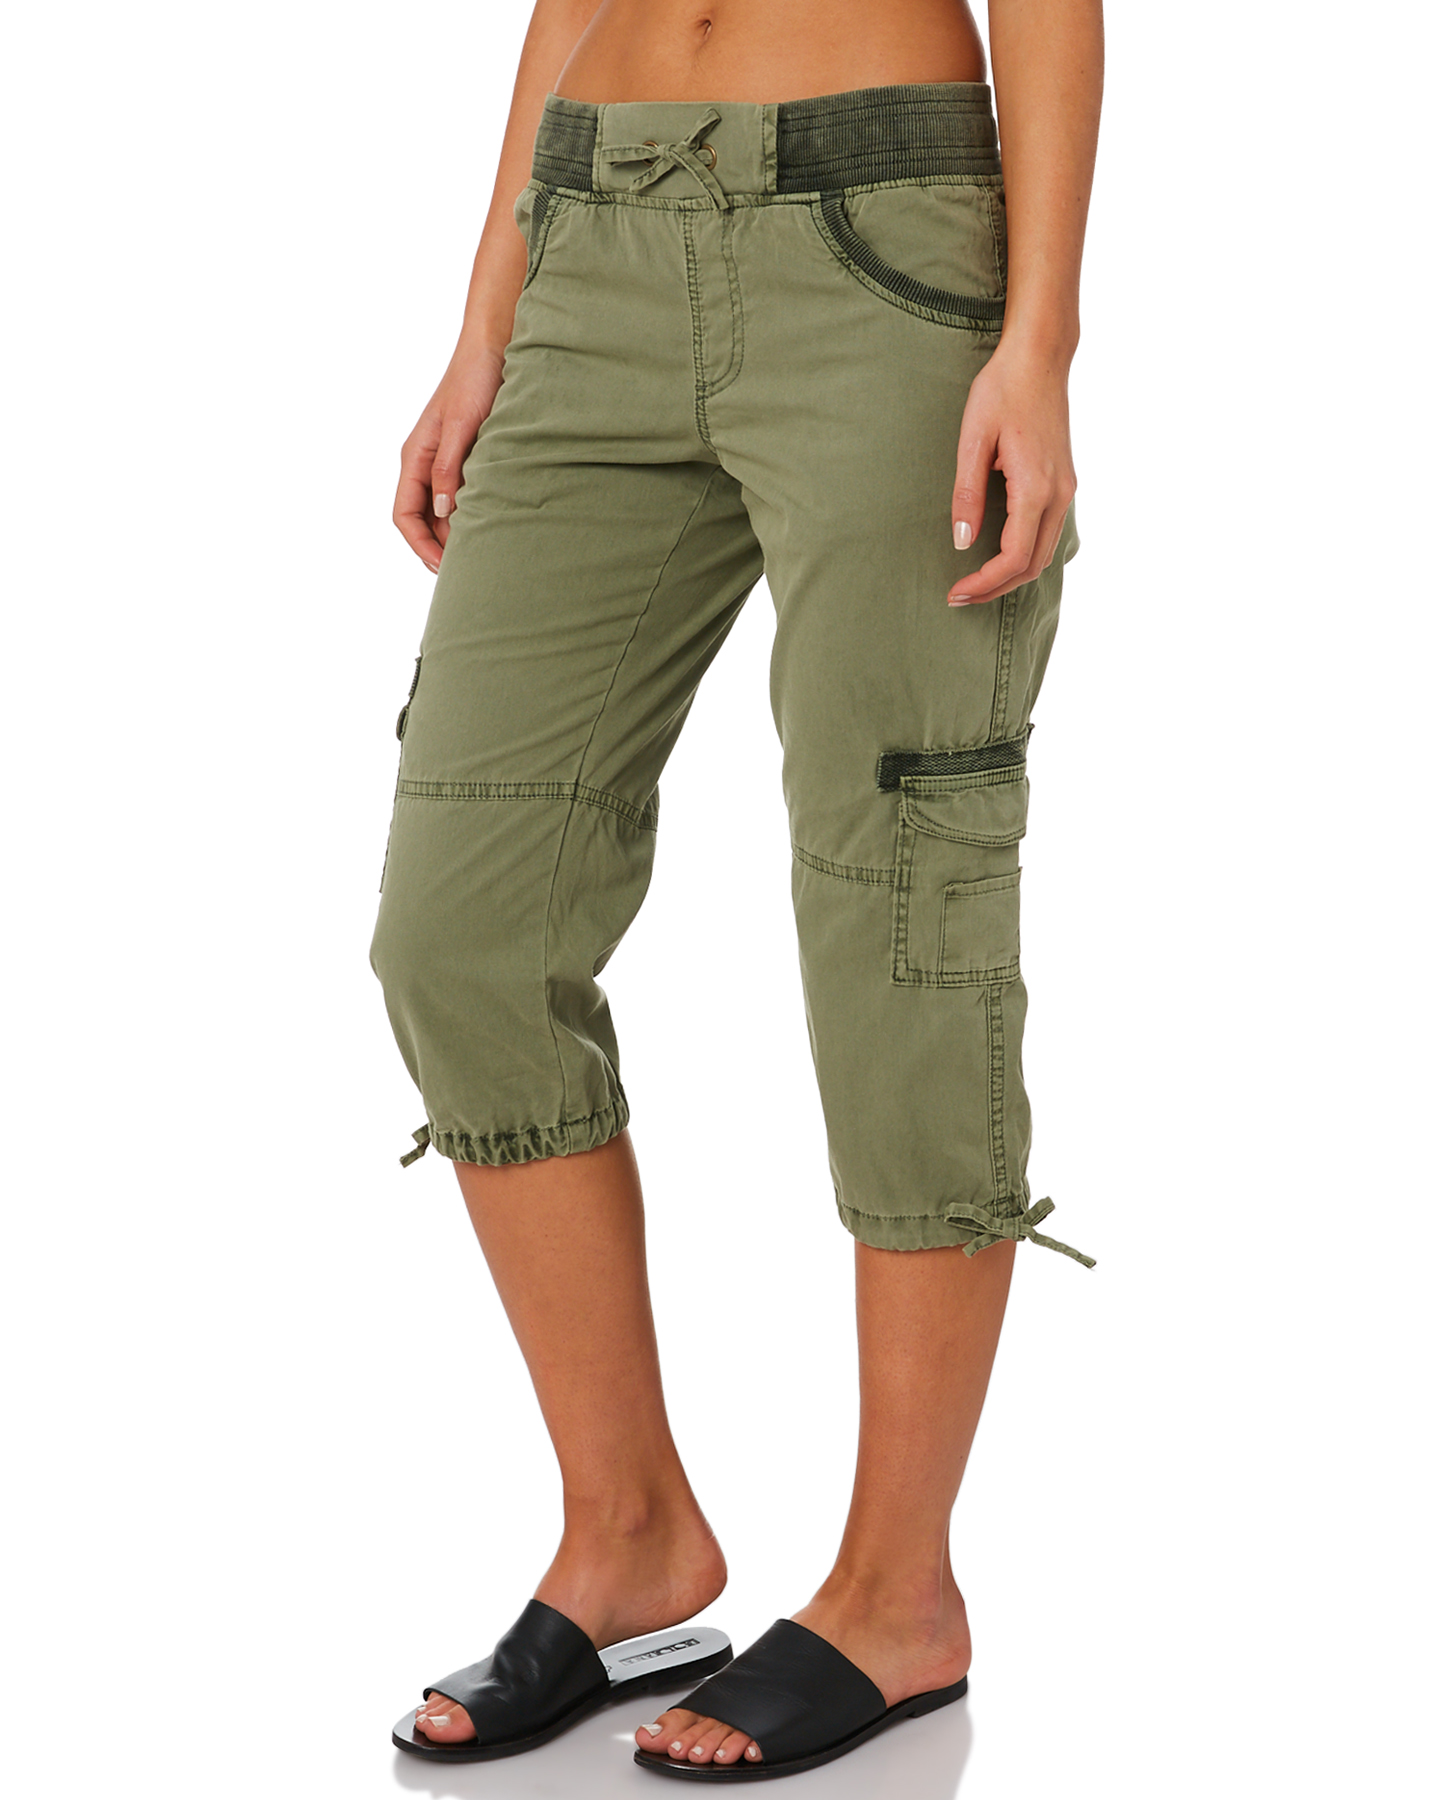 New-Swell-Women-039-s-Mayfair-3-4-Cargo-Pant-Cotton-Green thumbnail 7